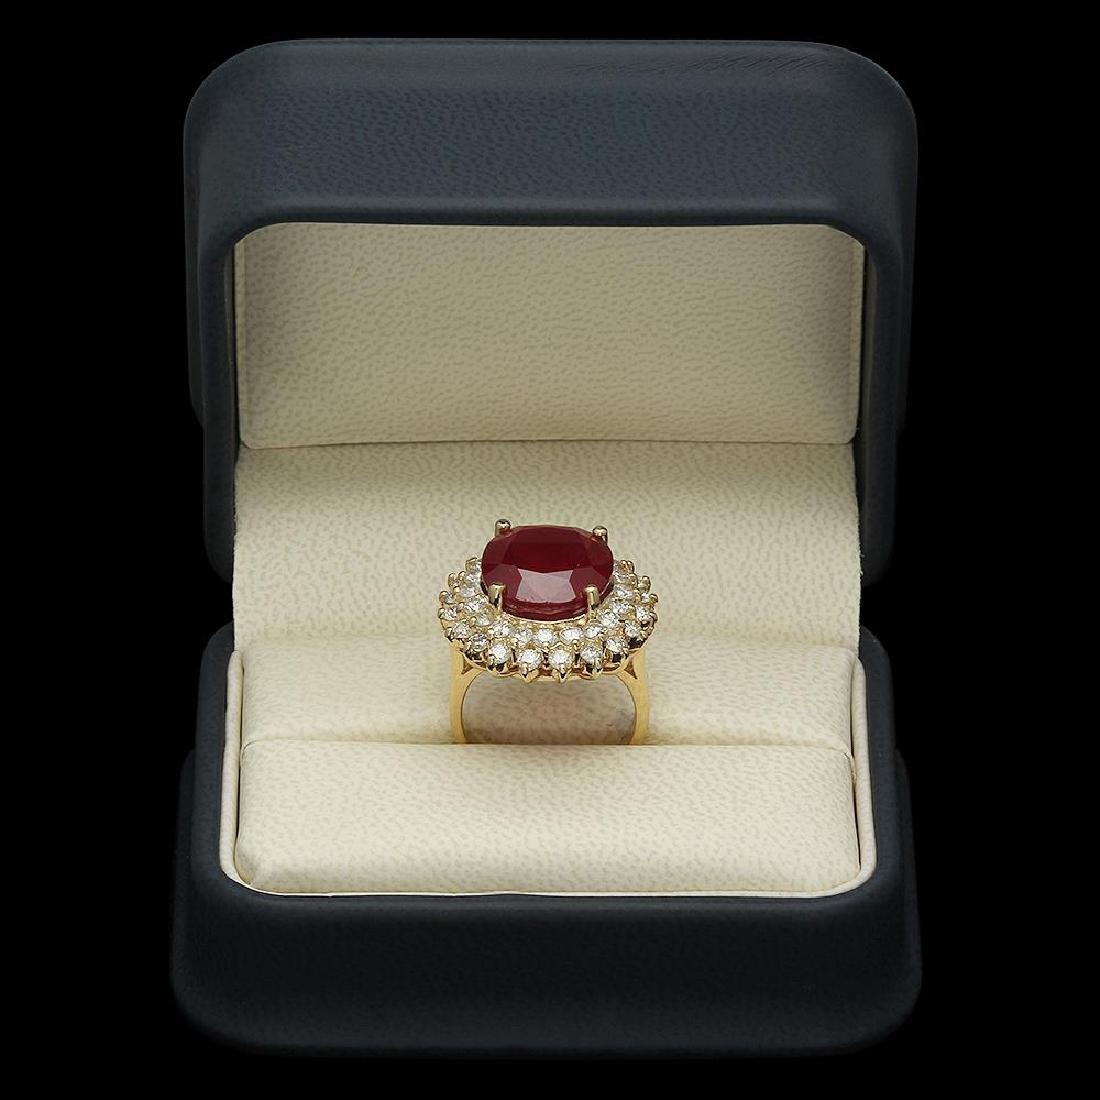 14K Gold 14.38ct Ruby 2.38ct Diamond Ring - 4